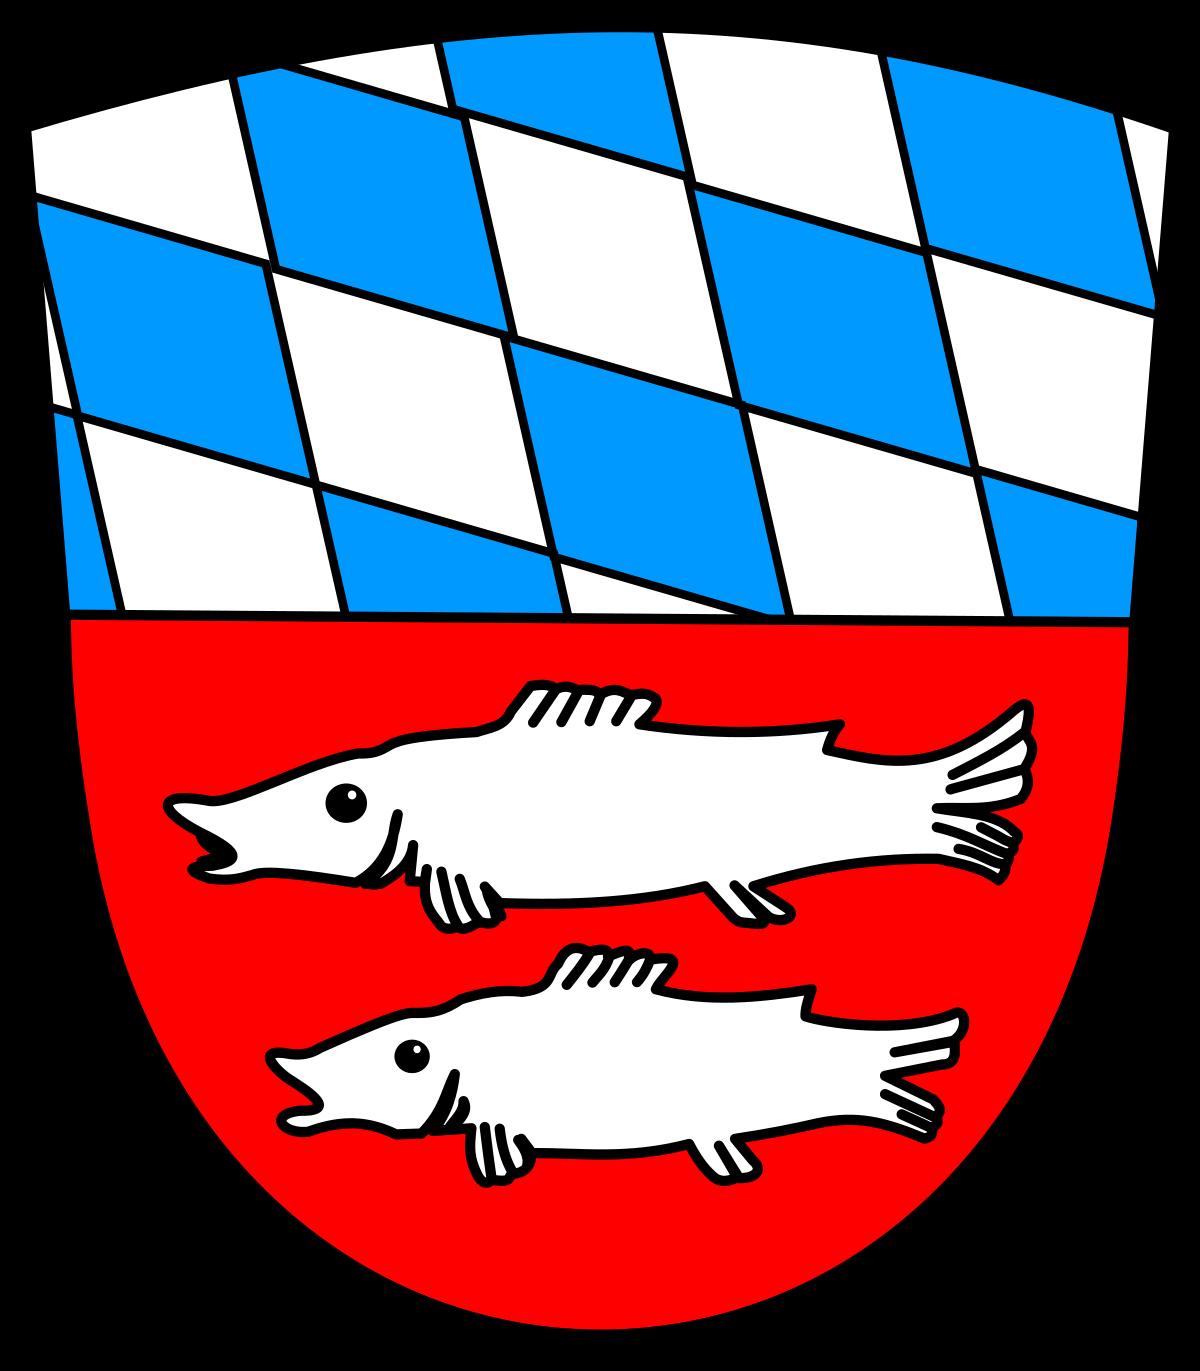 Boarisch Gmoa.